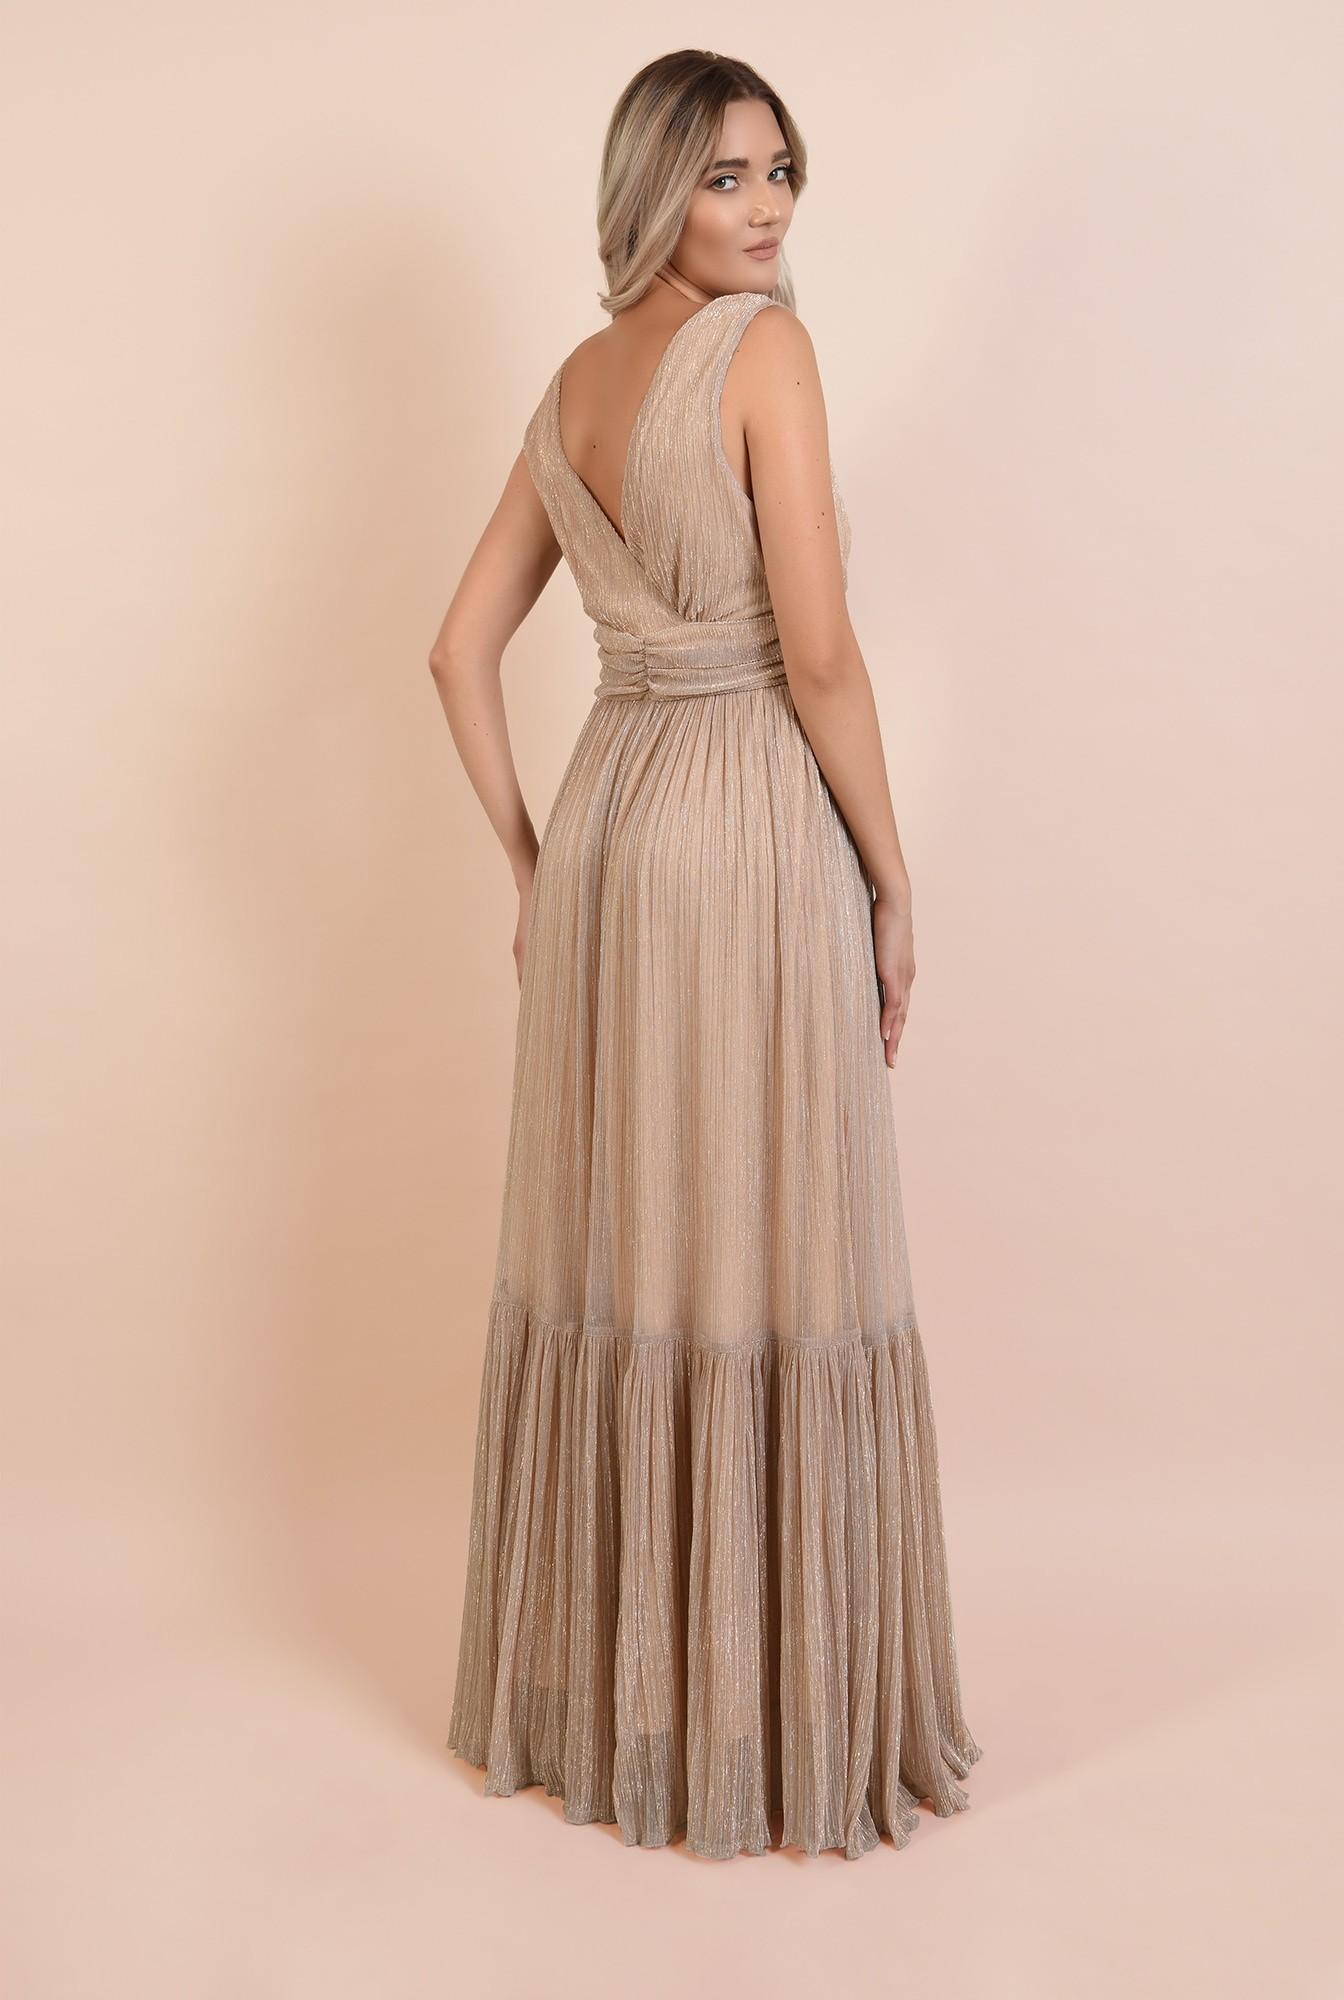 1 - 360 - rochie lunga, de seara, lurex, decolteu in V, betelie fronsata, Poema